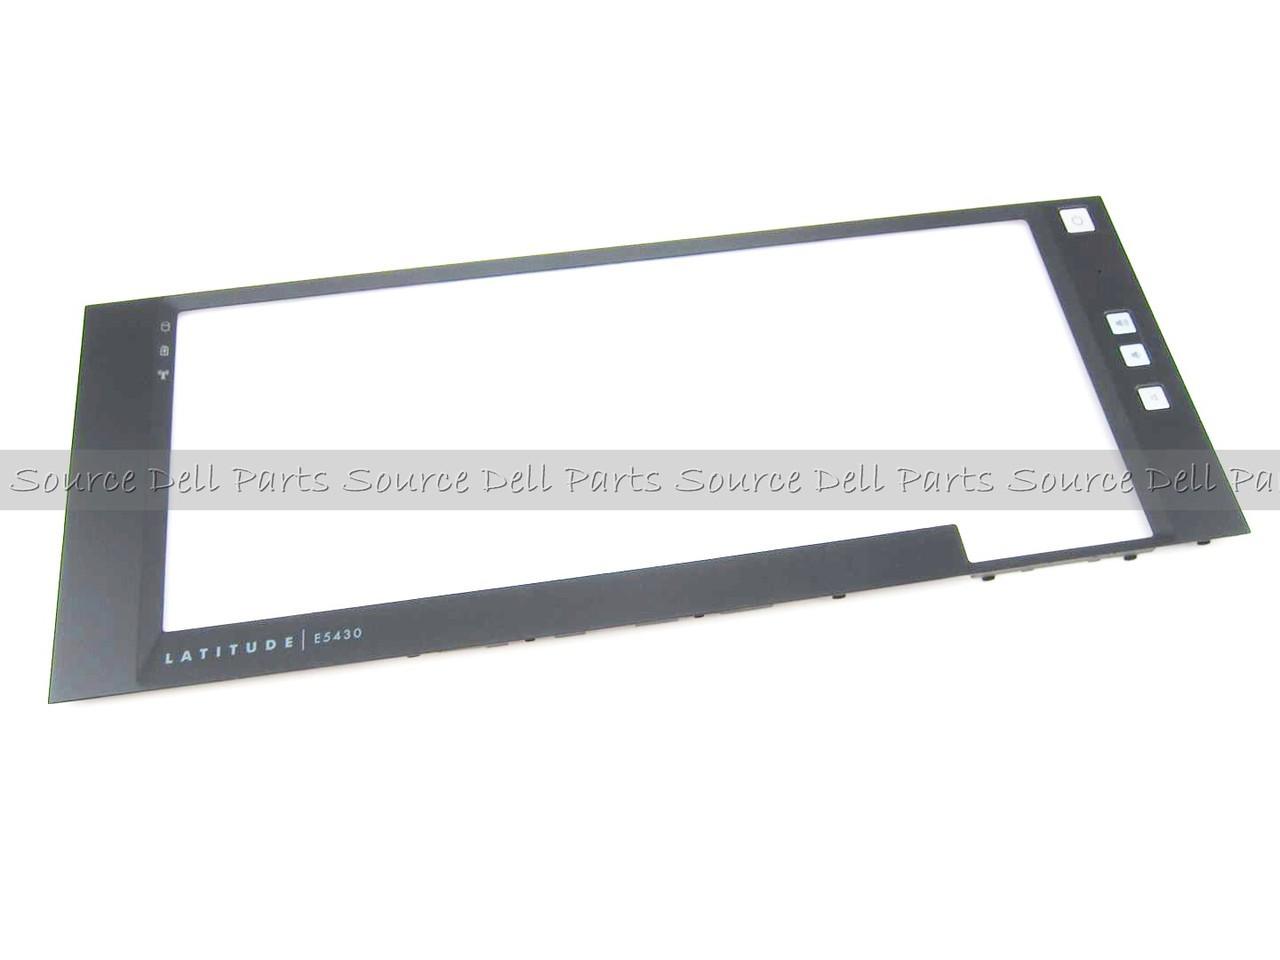 Dell Latitude E5430 Single Point Keyboard Bezel Trim Overlay - G4J21